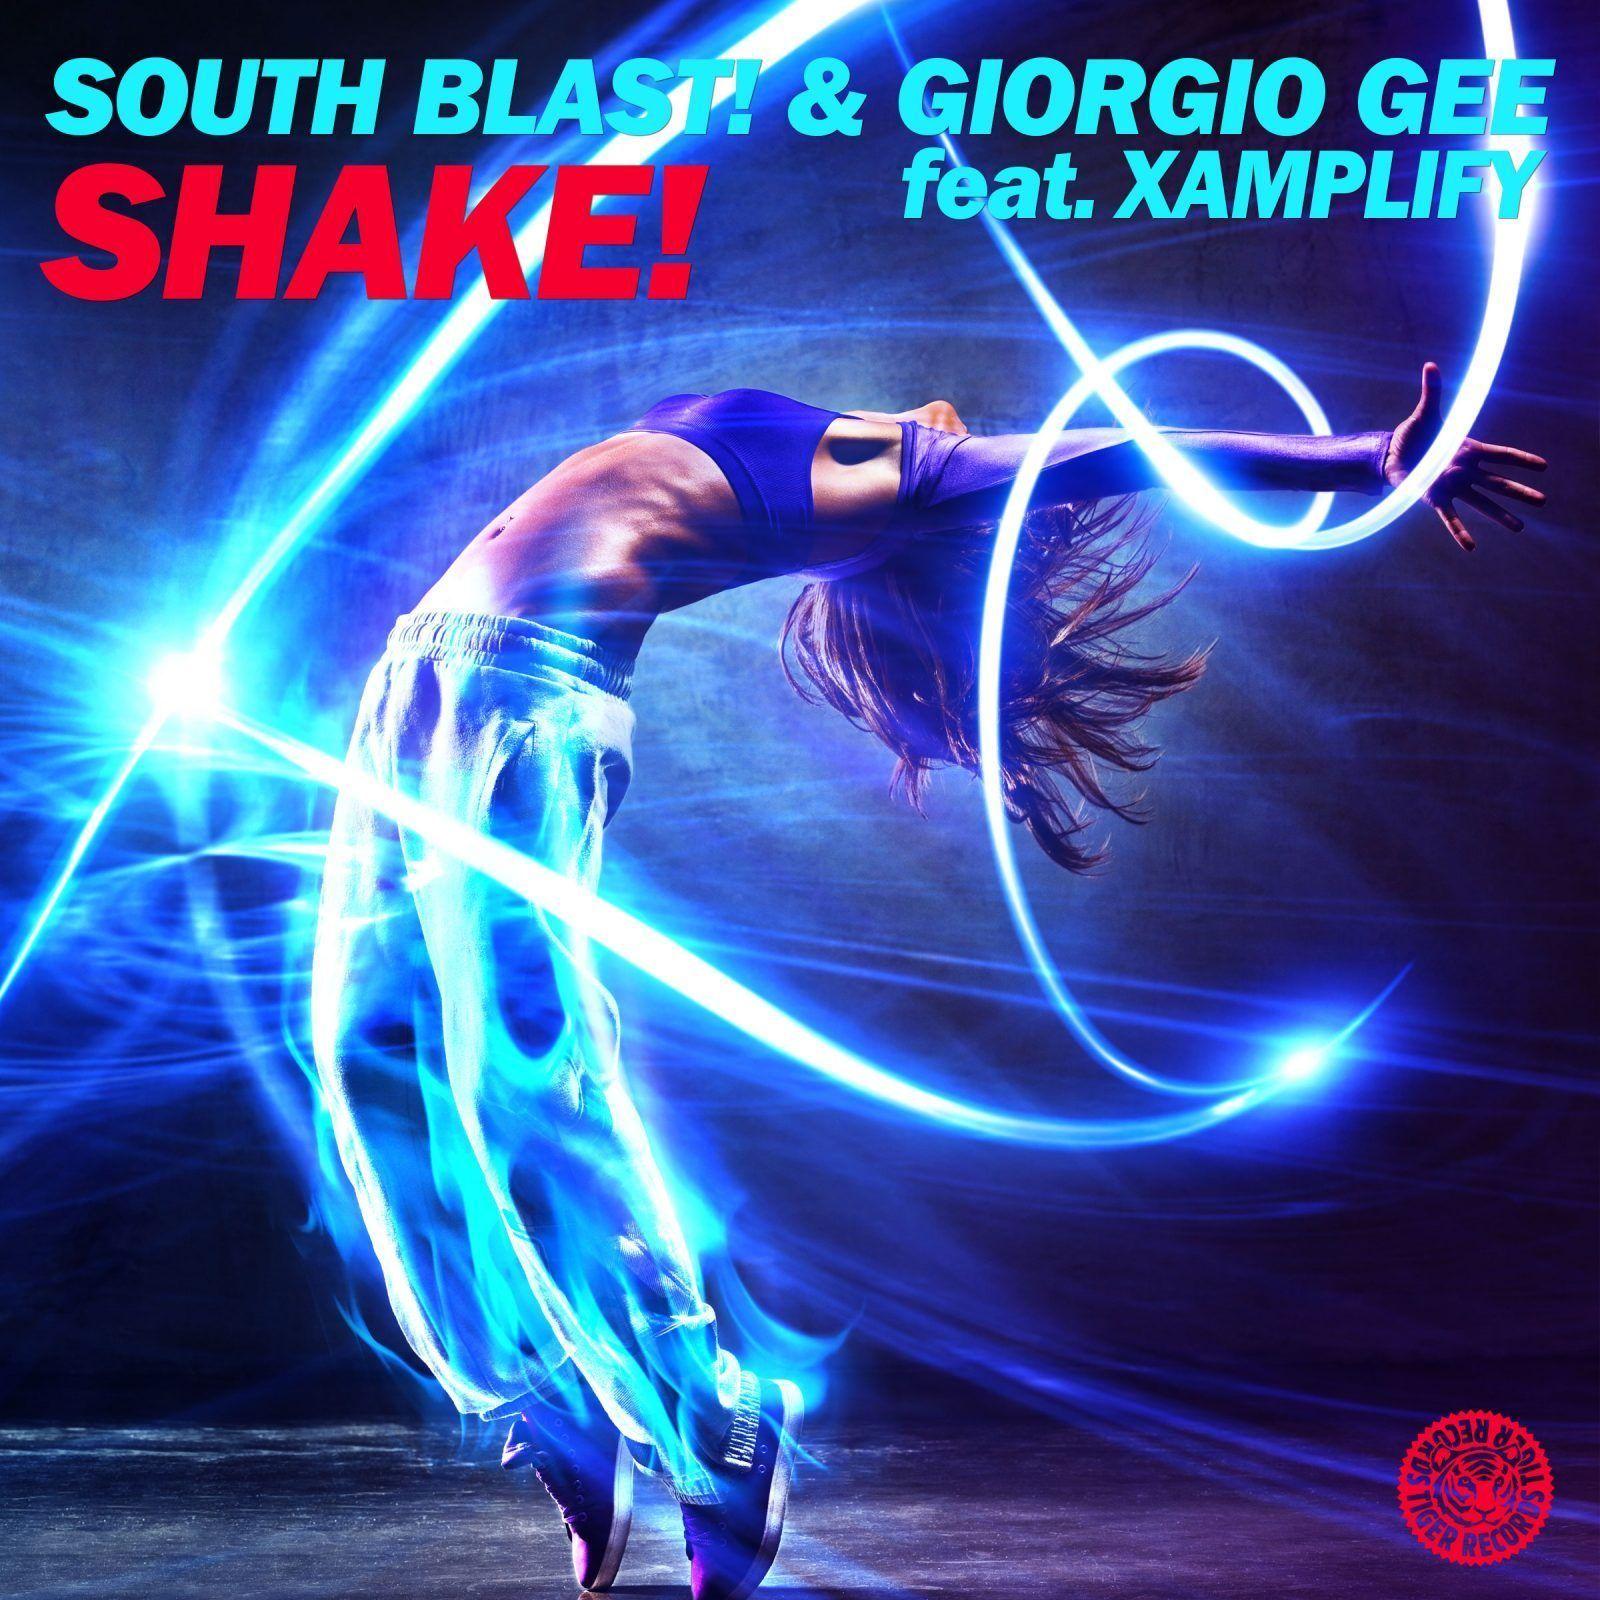 southblastgiorgiogeeft.xamplify-shake.jpg